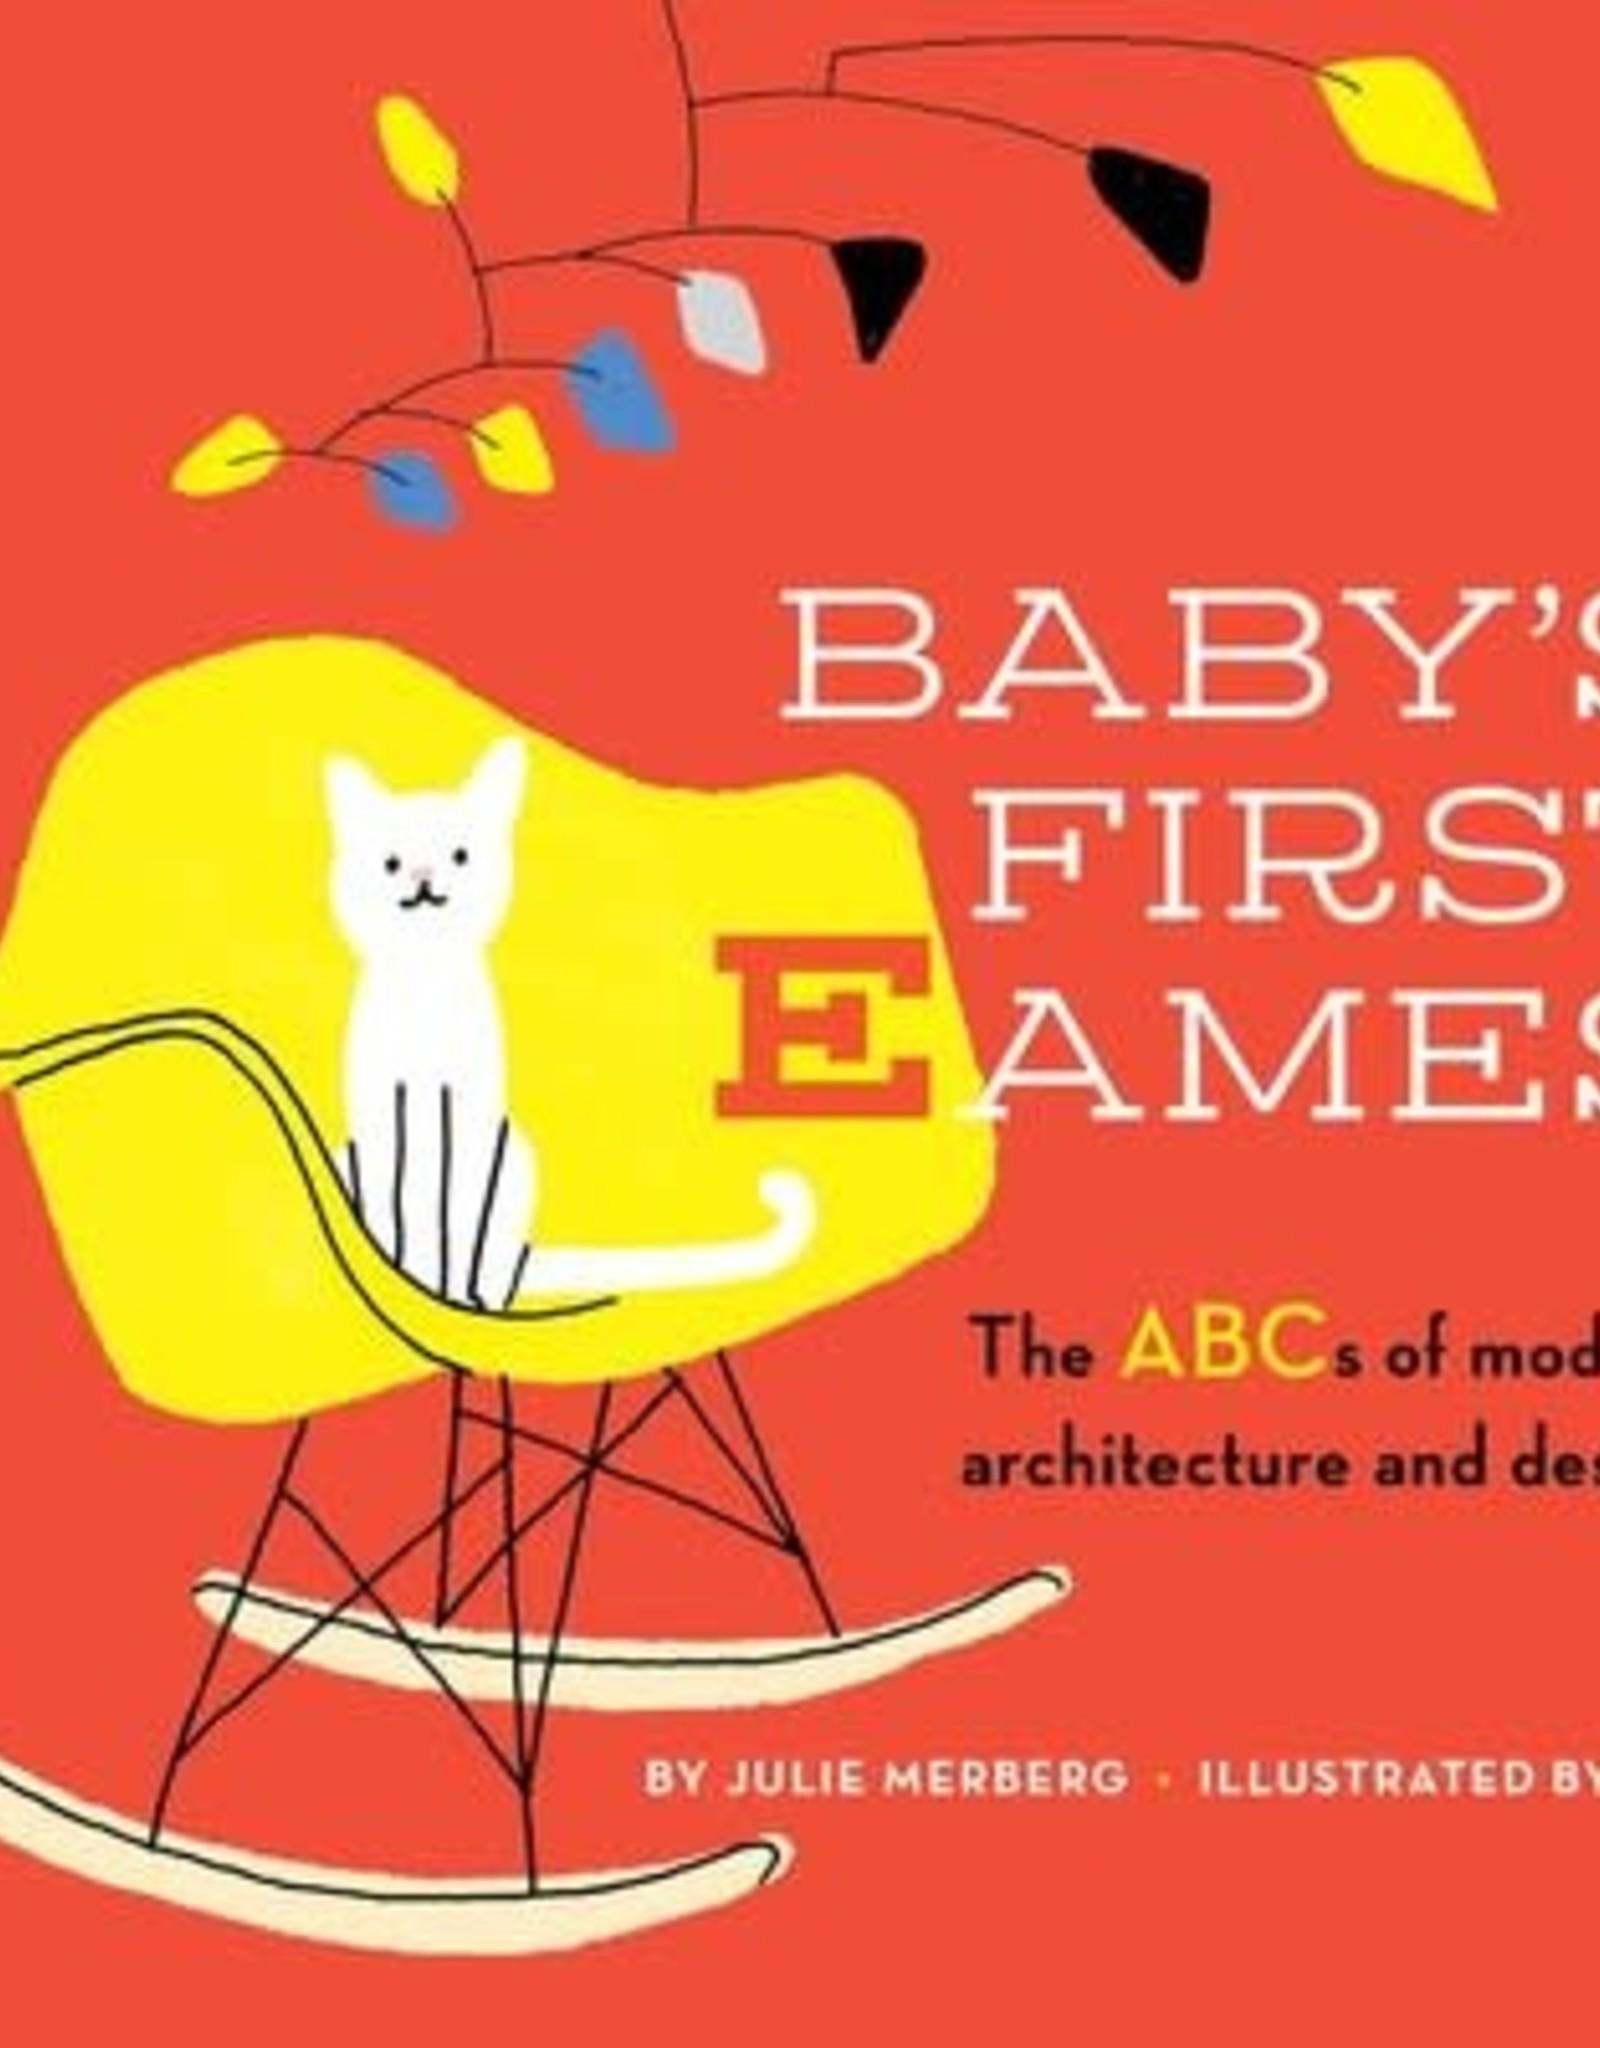 Simon & Schuster Baby's First Eames